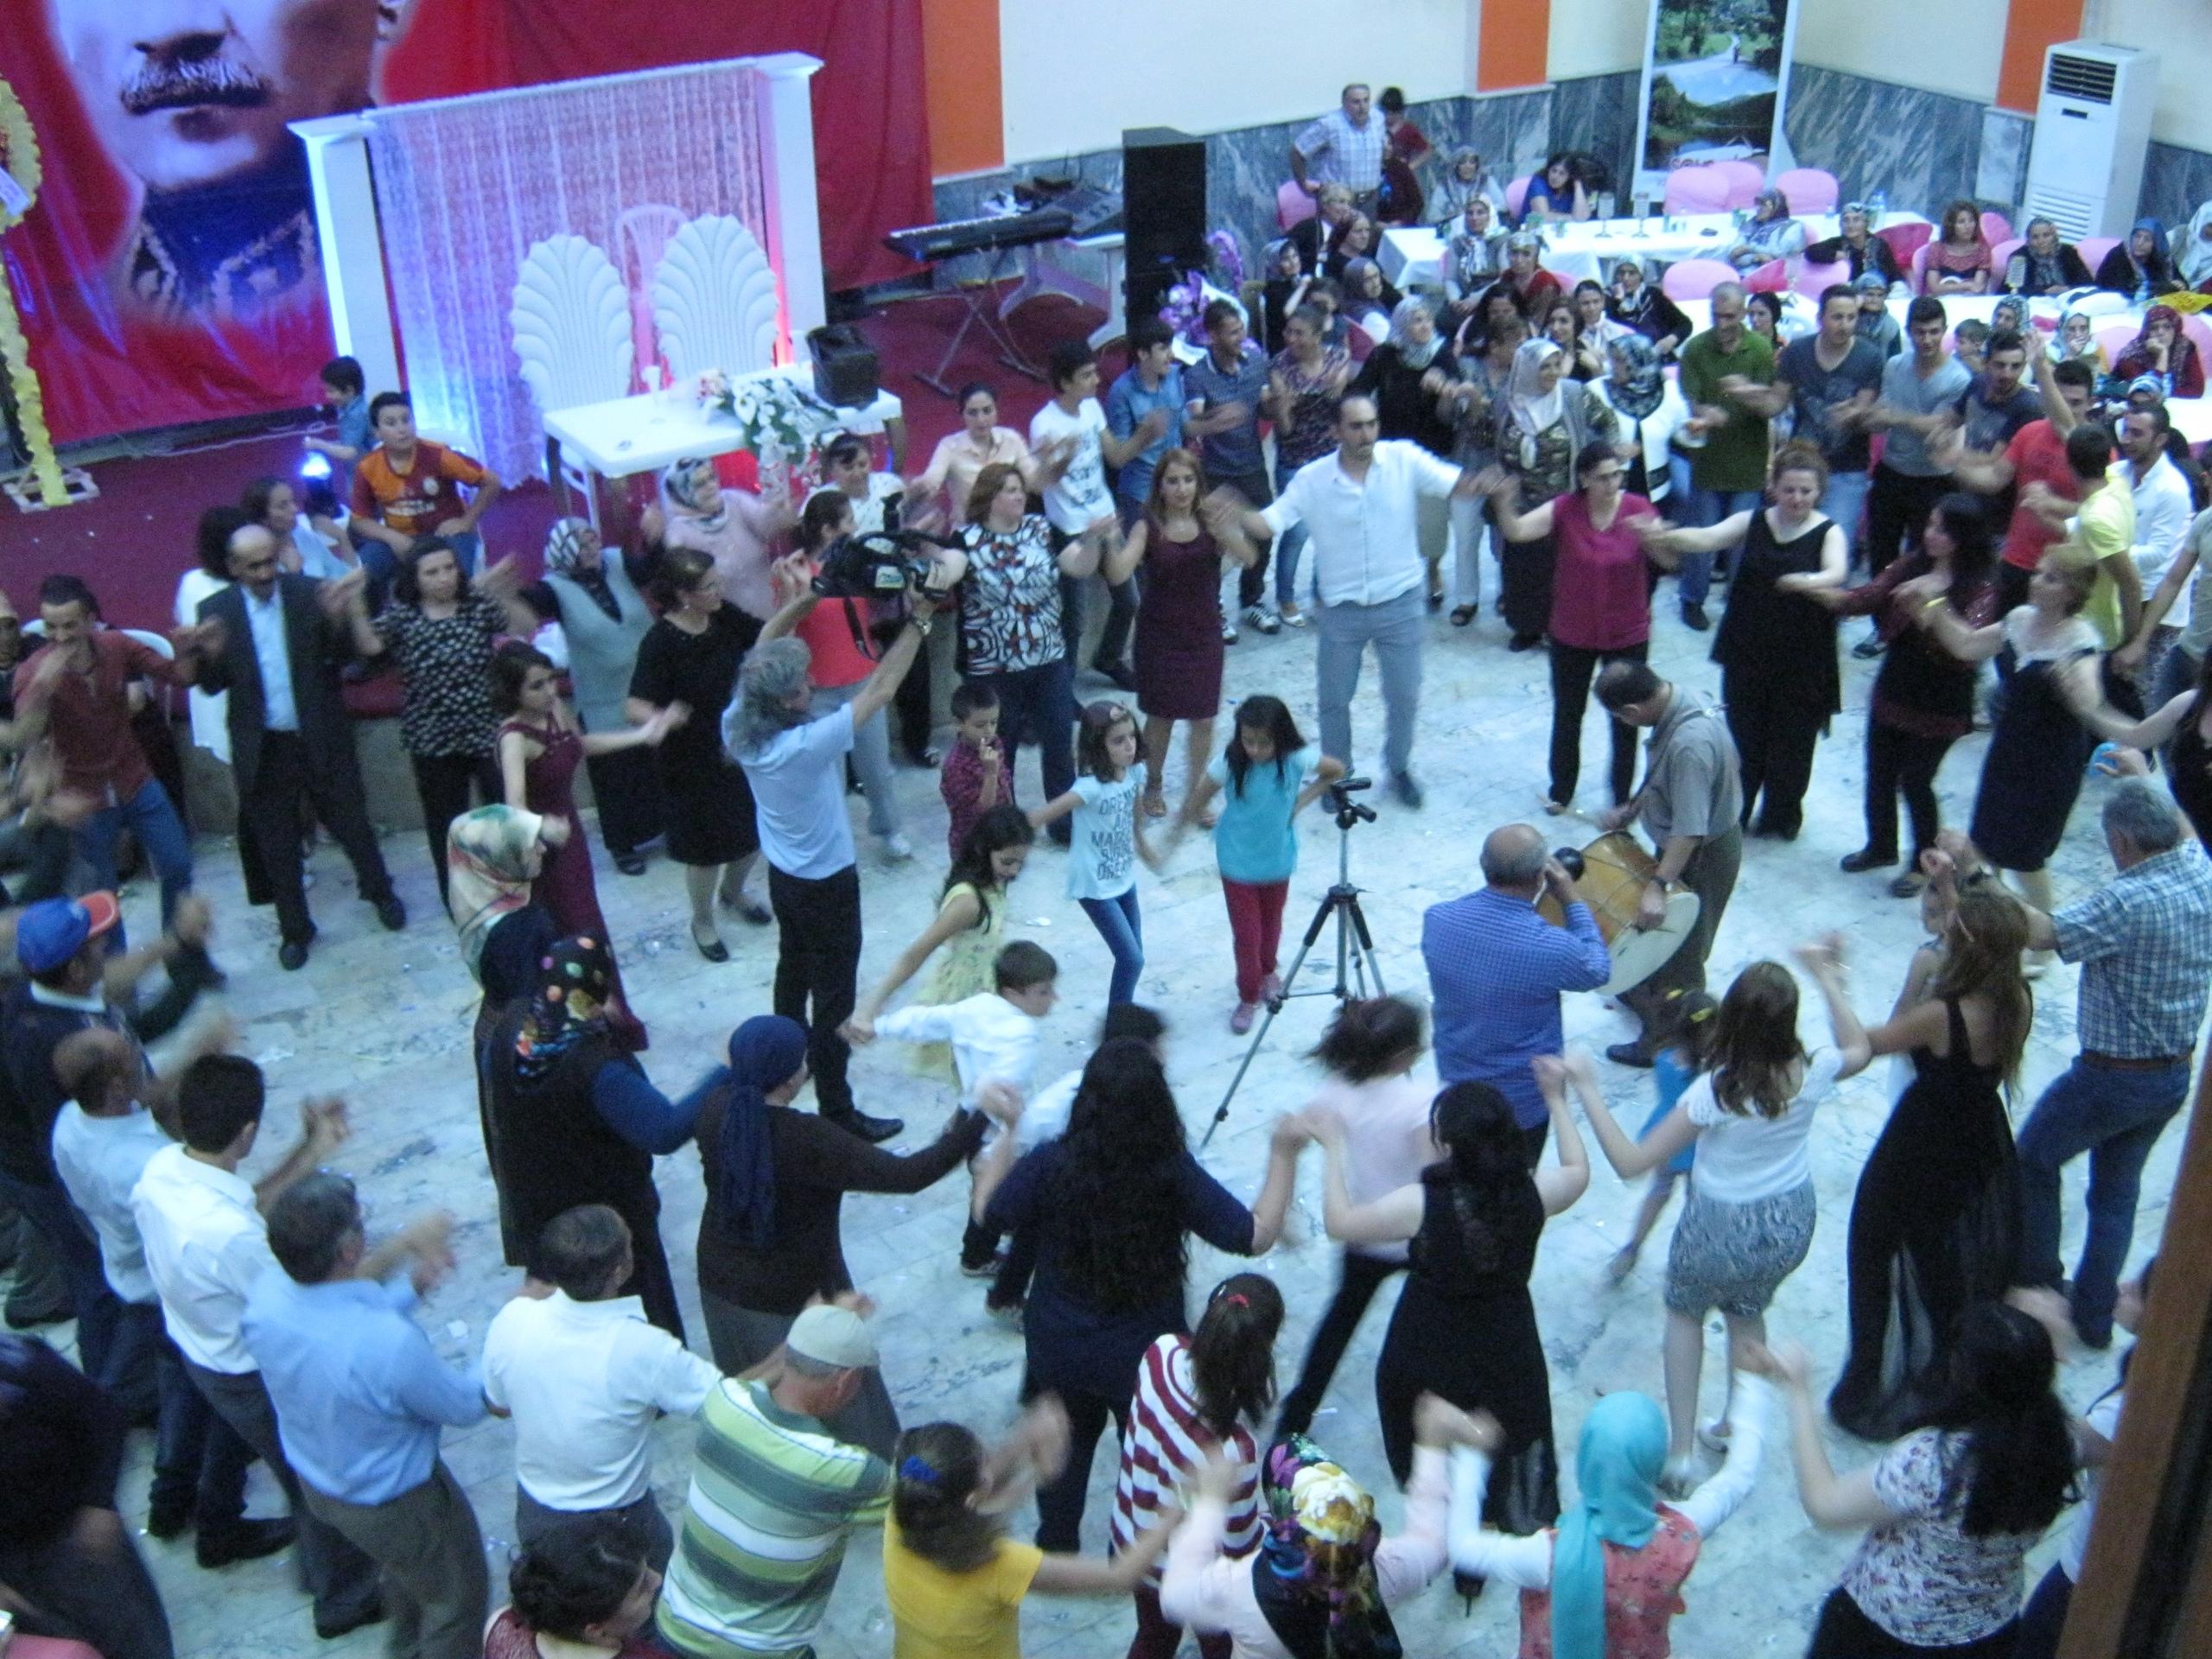 На турецких свадьбах танцуют по кругу